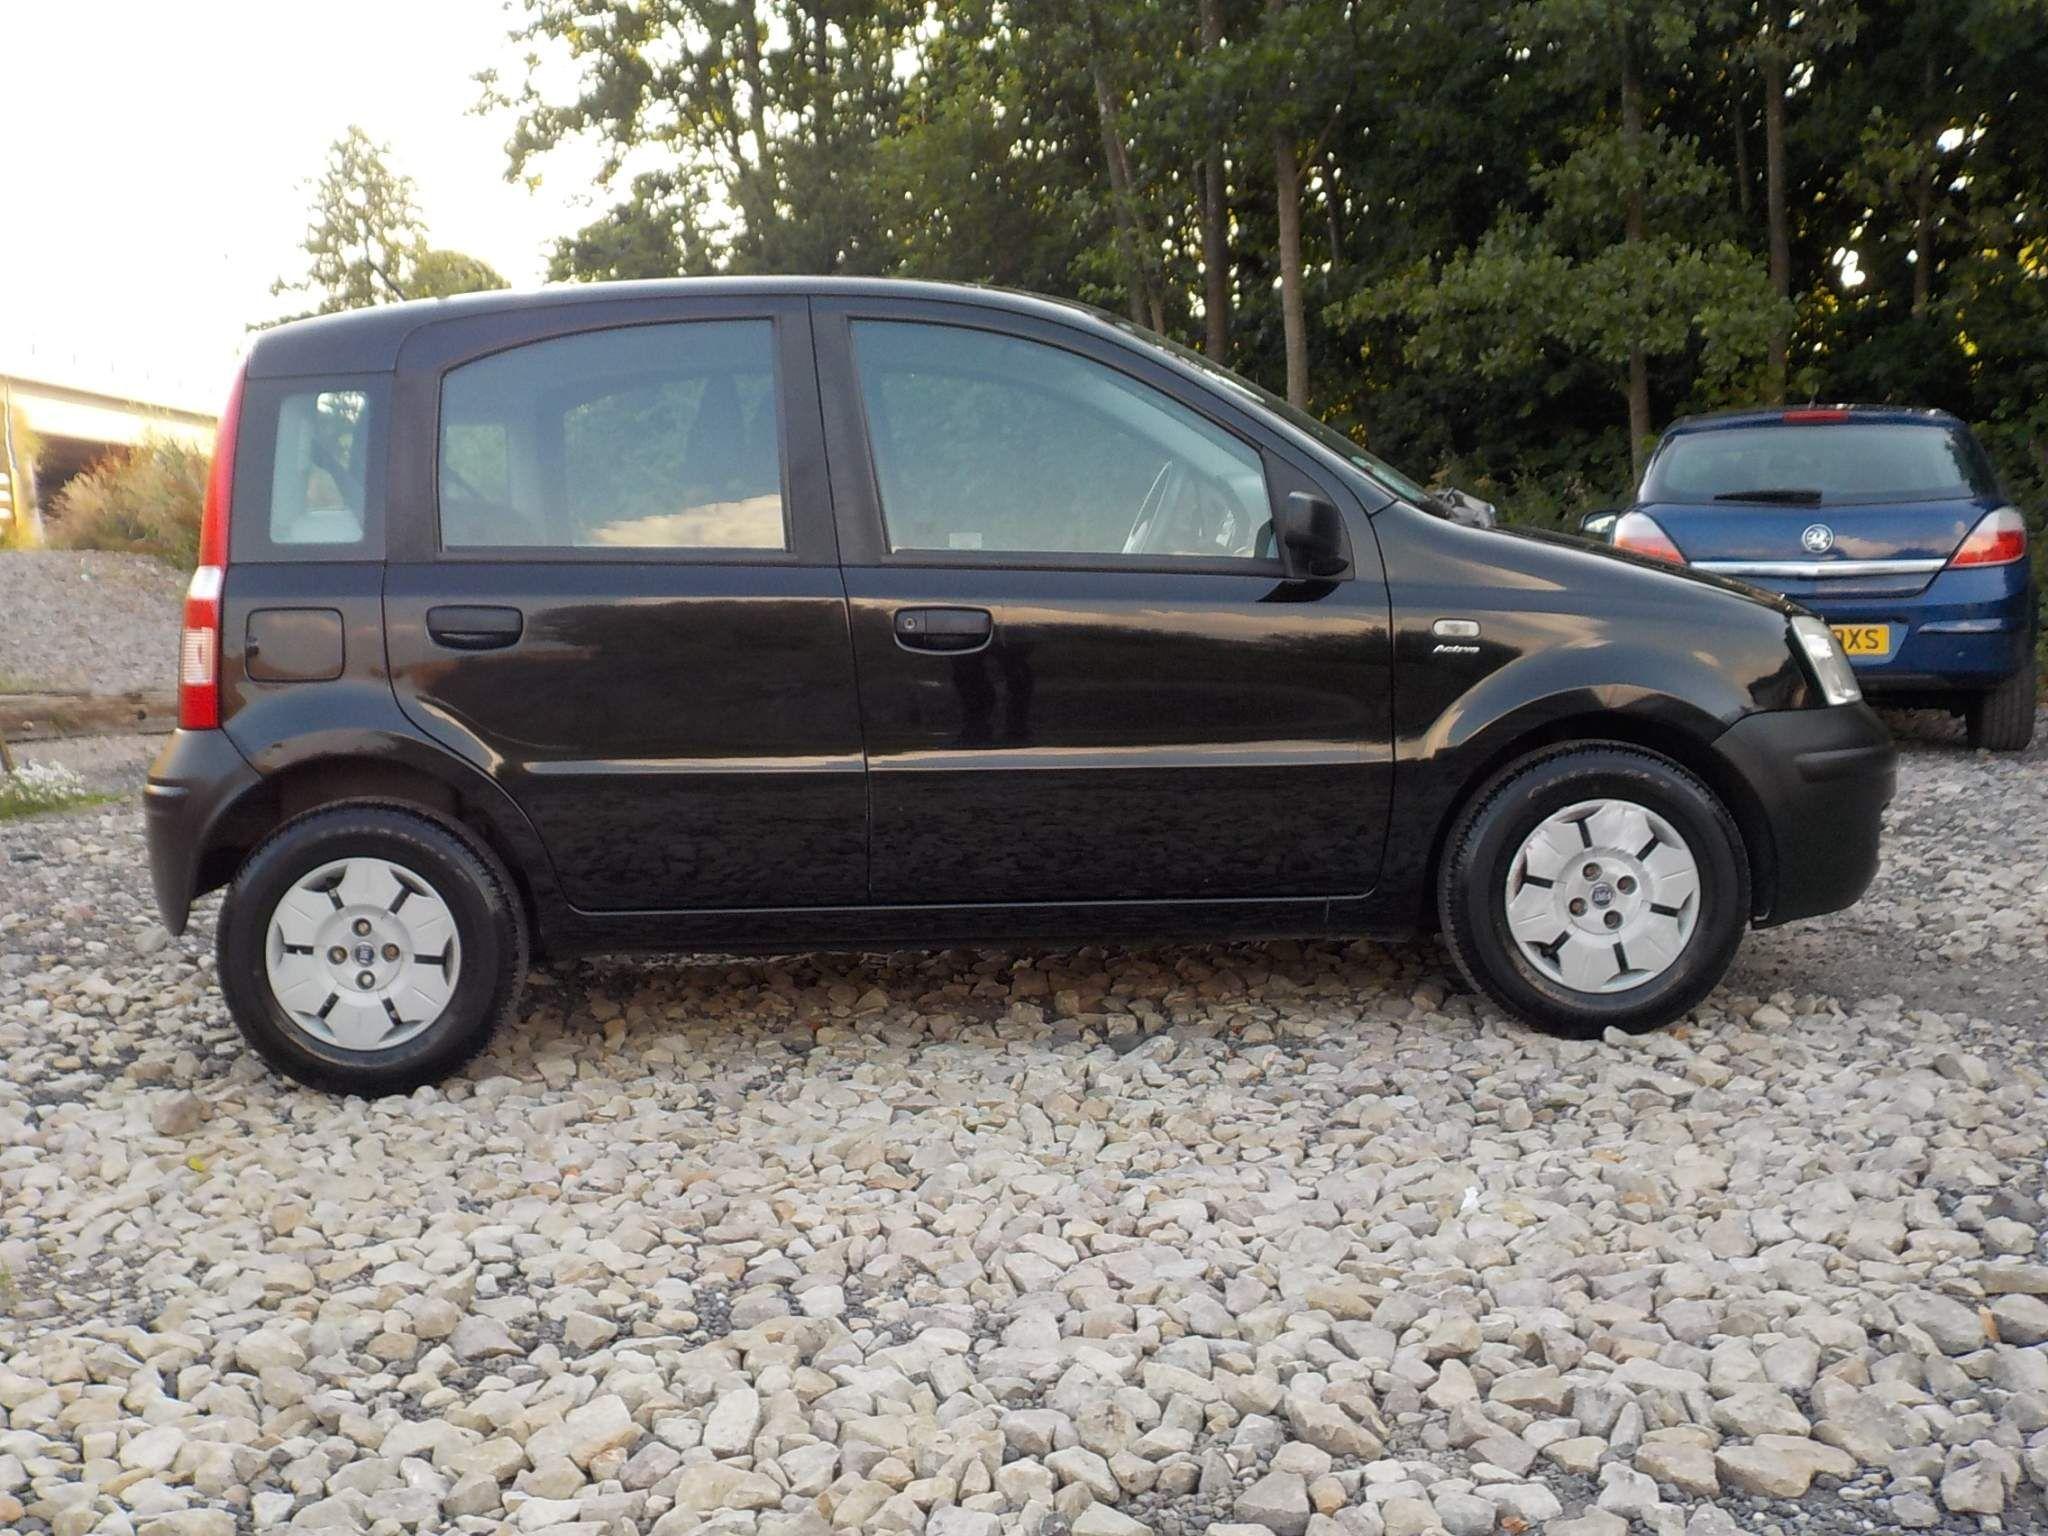 Fiat Panda 1.1 Active 5dr